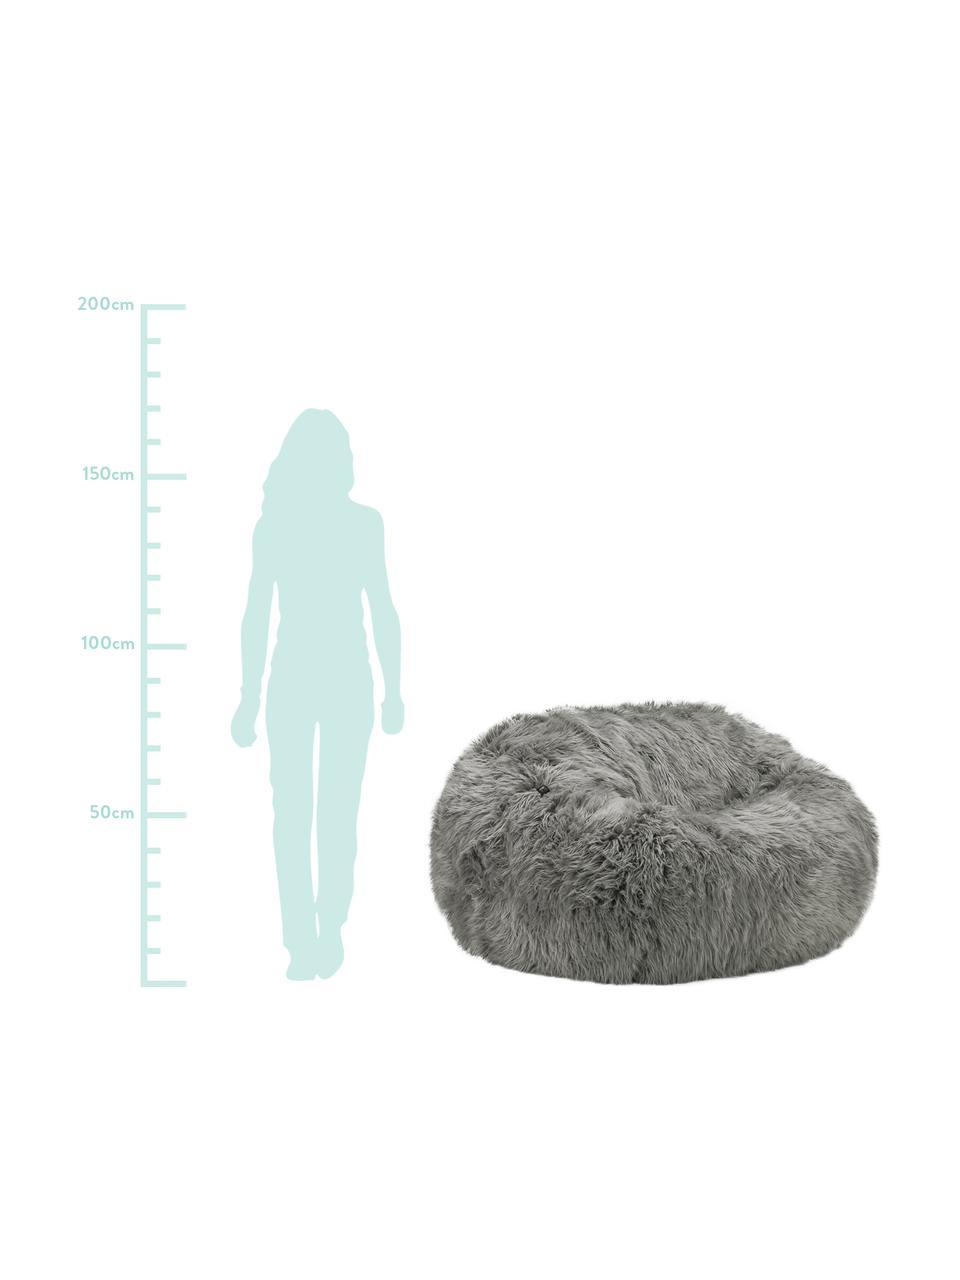 Poltrona sacco in similpelle Flokati, Rivestimento: 95% acrilico, 5% polieste, Grigio, Ø 140 x Alt. 90 cm